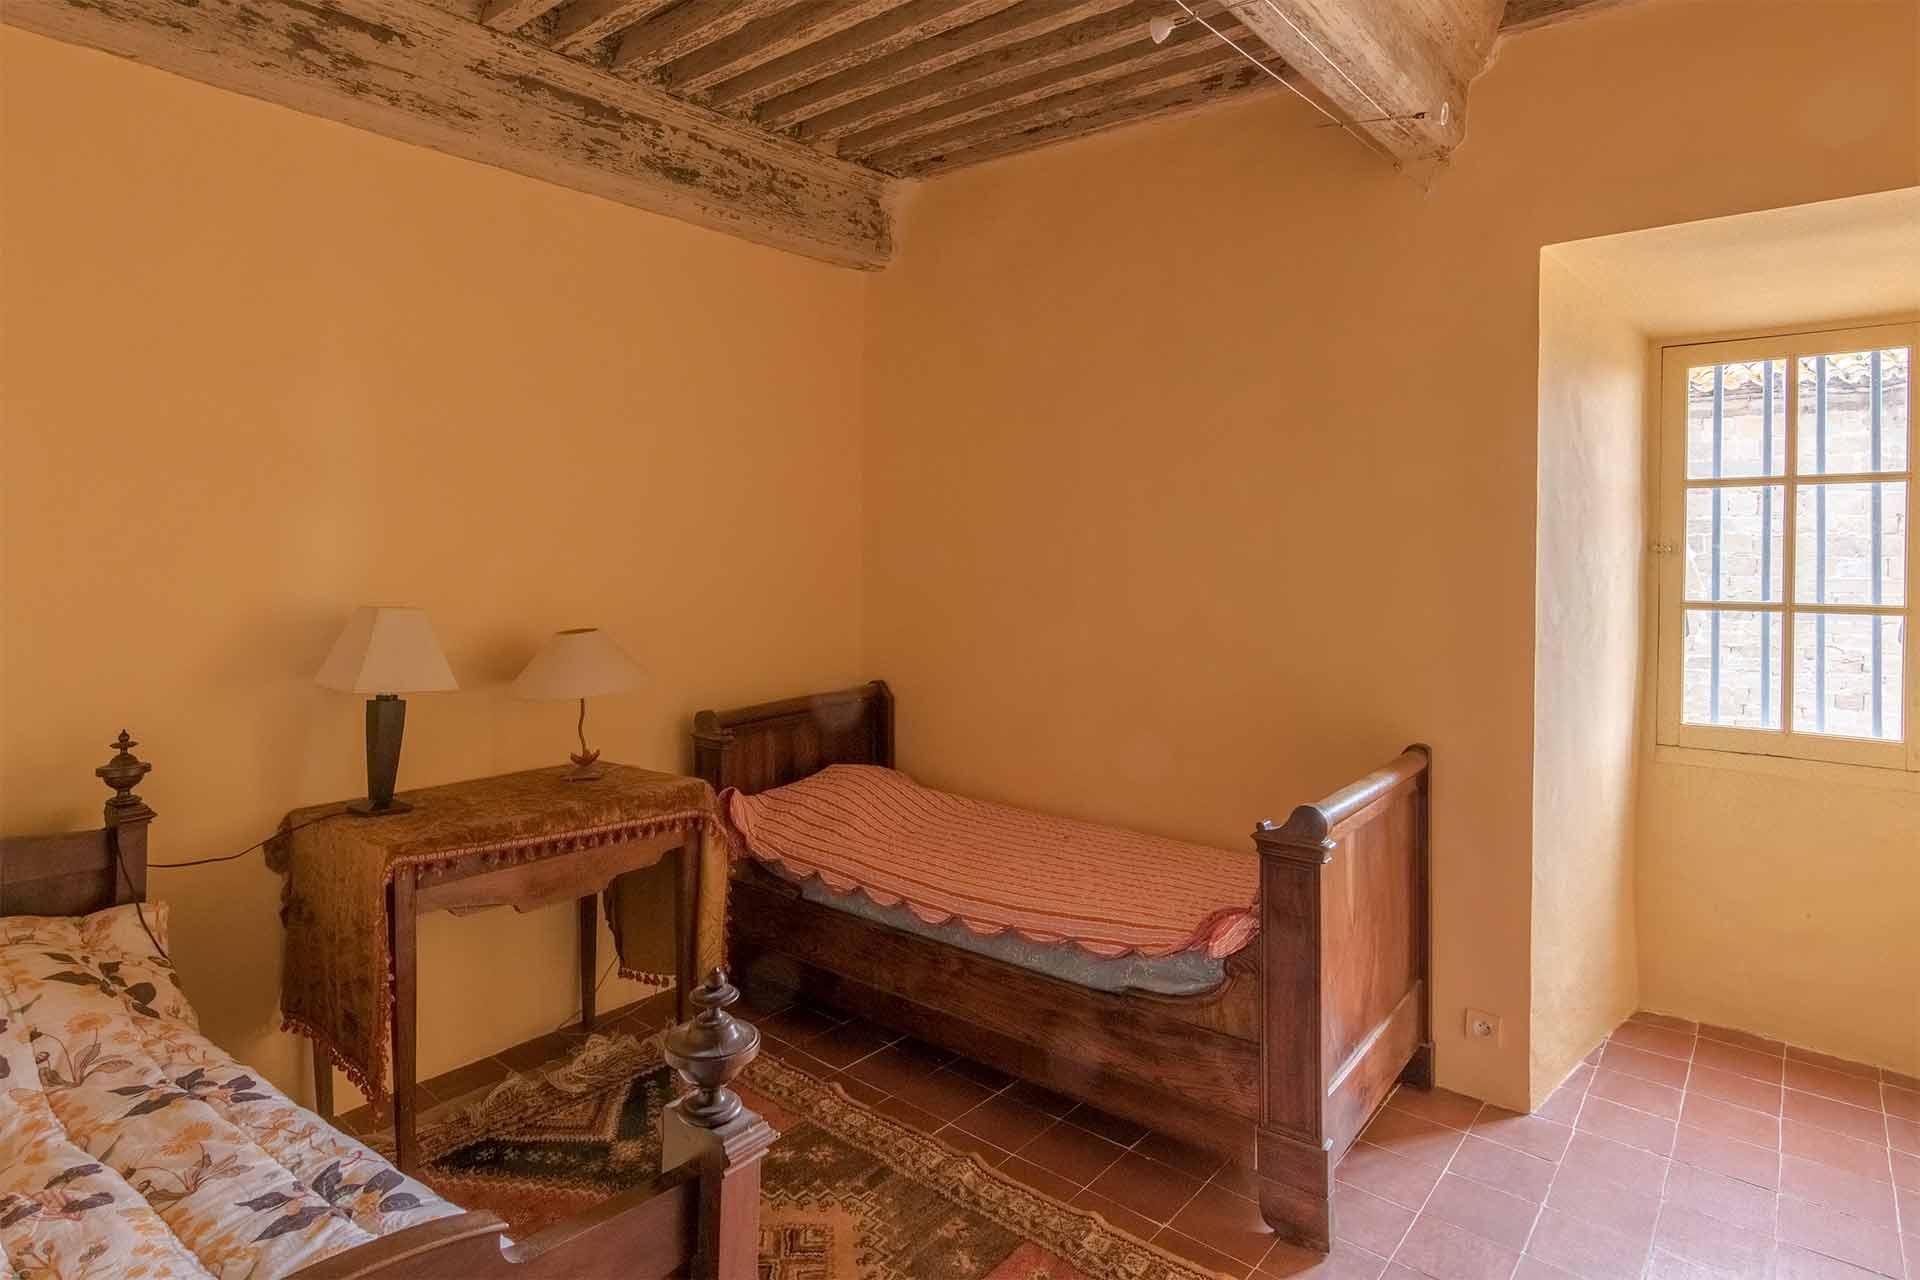 Chambres ch teau de puich ric for Prix chambre chateau vallery